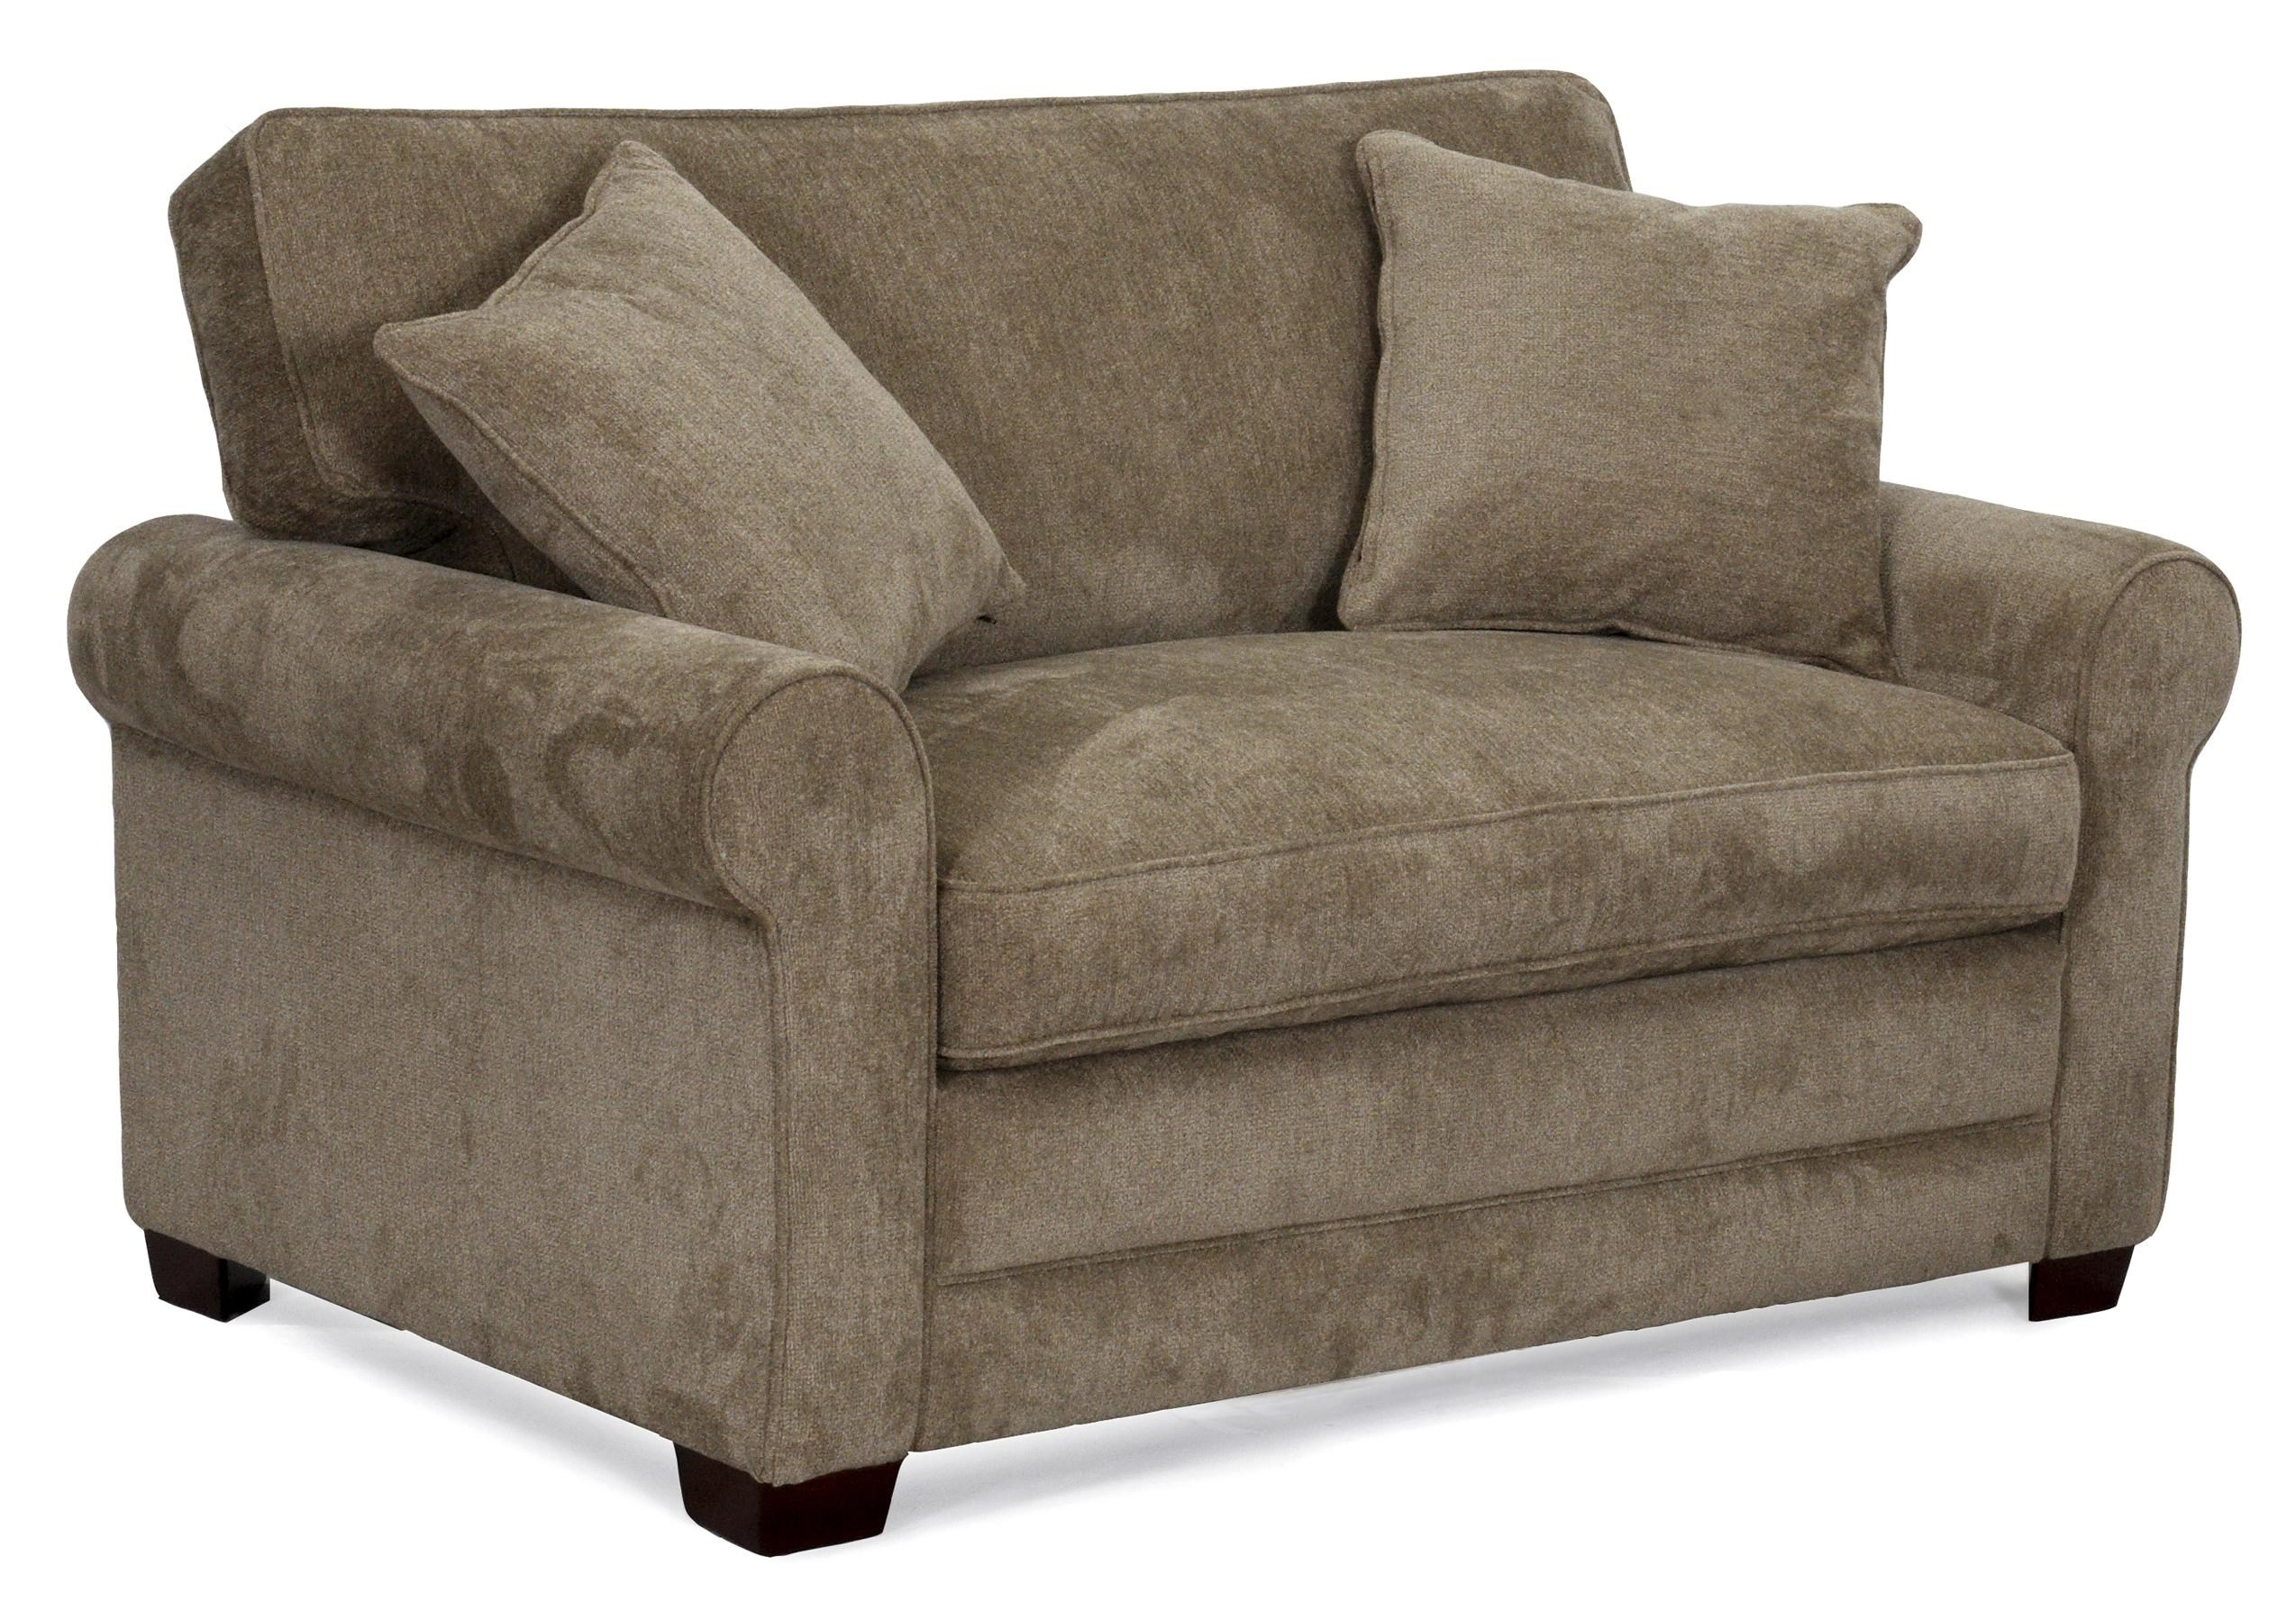 synergy home furnishings twin sleeper sofa with rolled arms zaku0027s fine furniture sofa sleeper